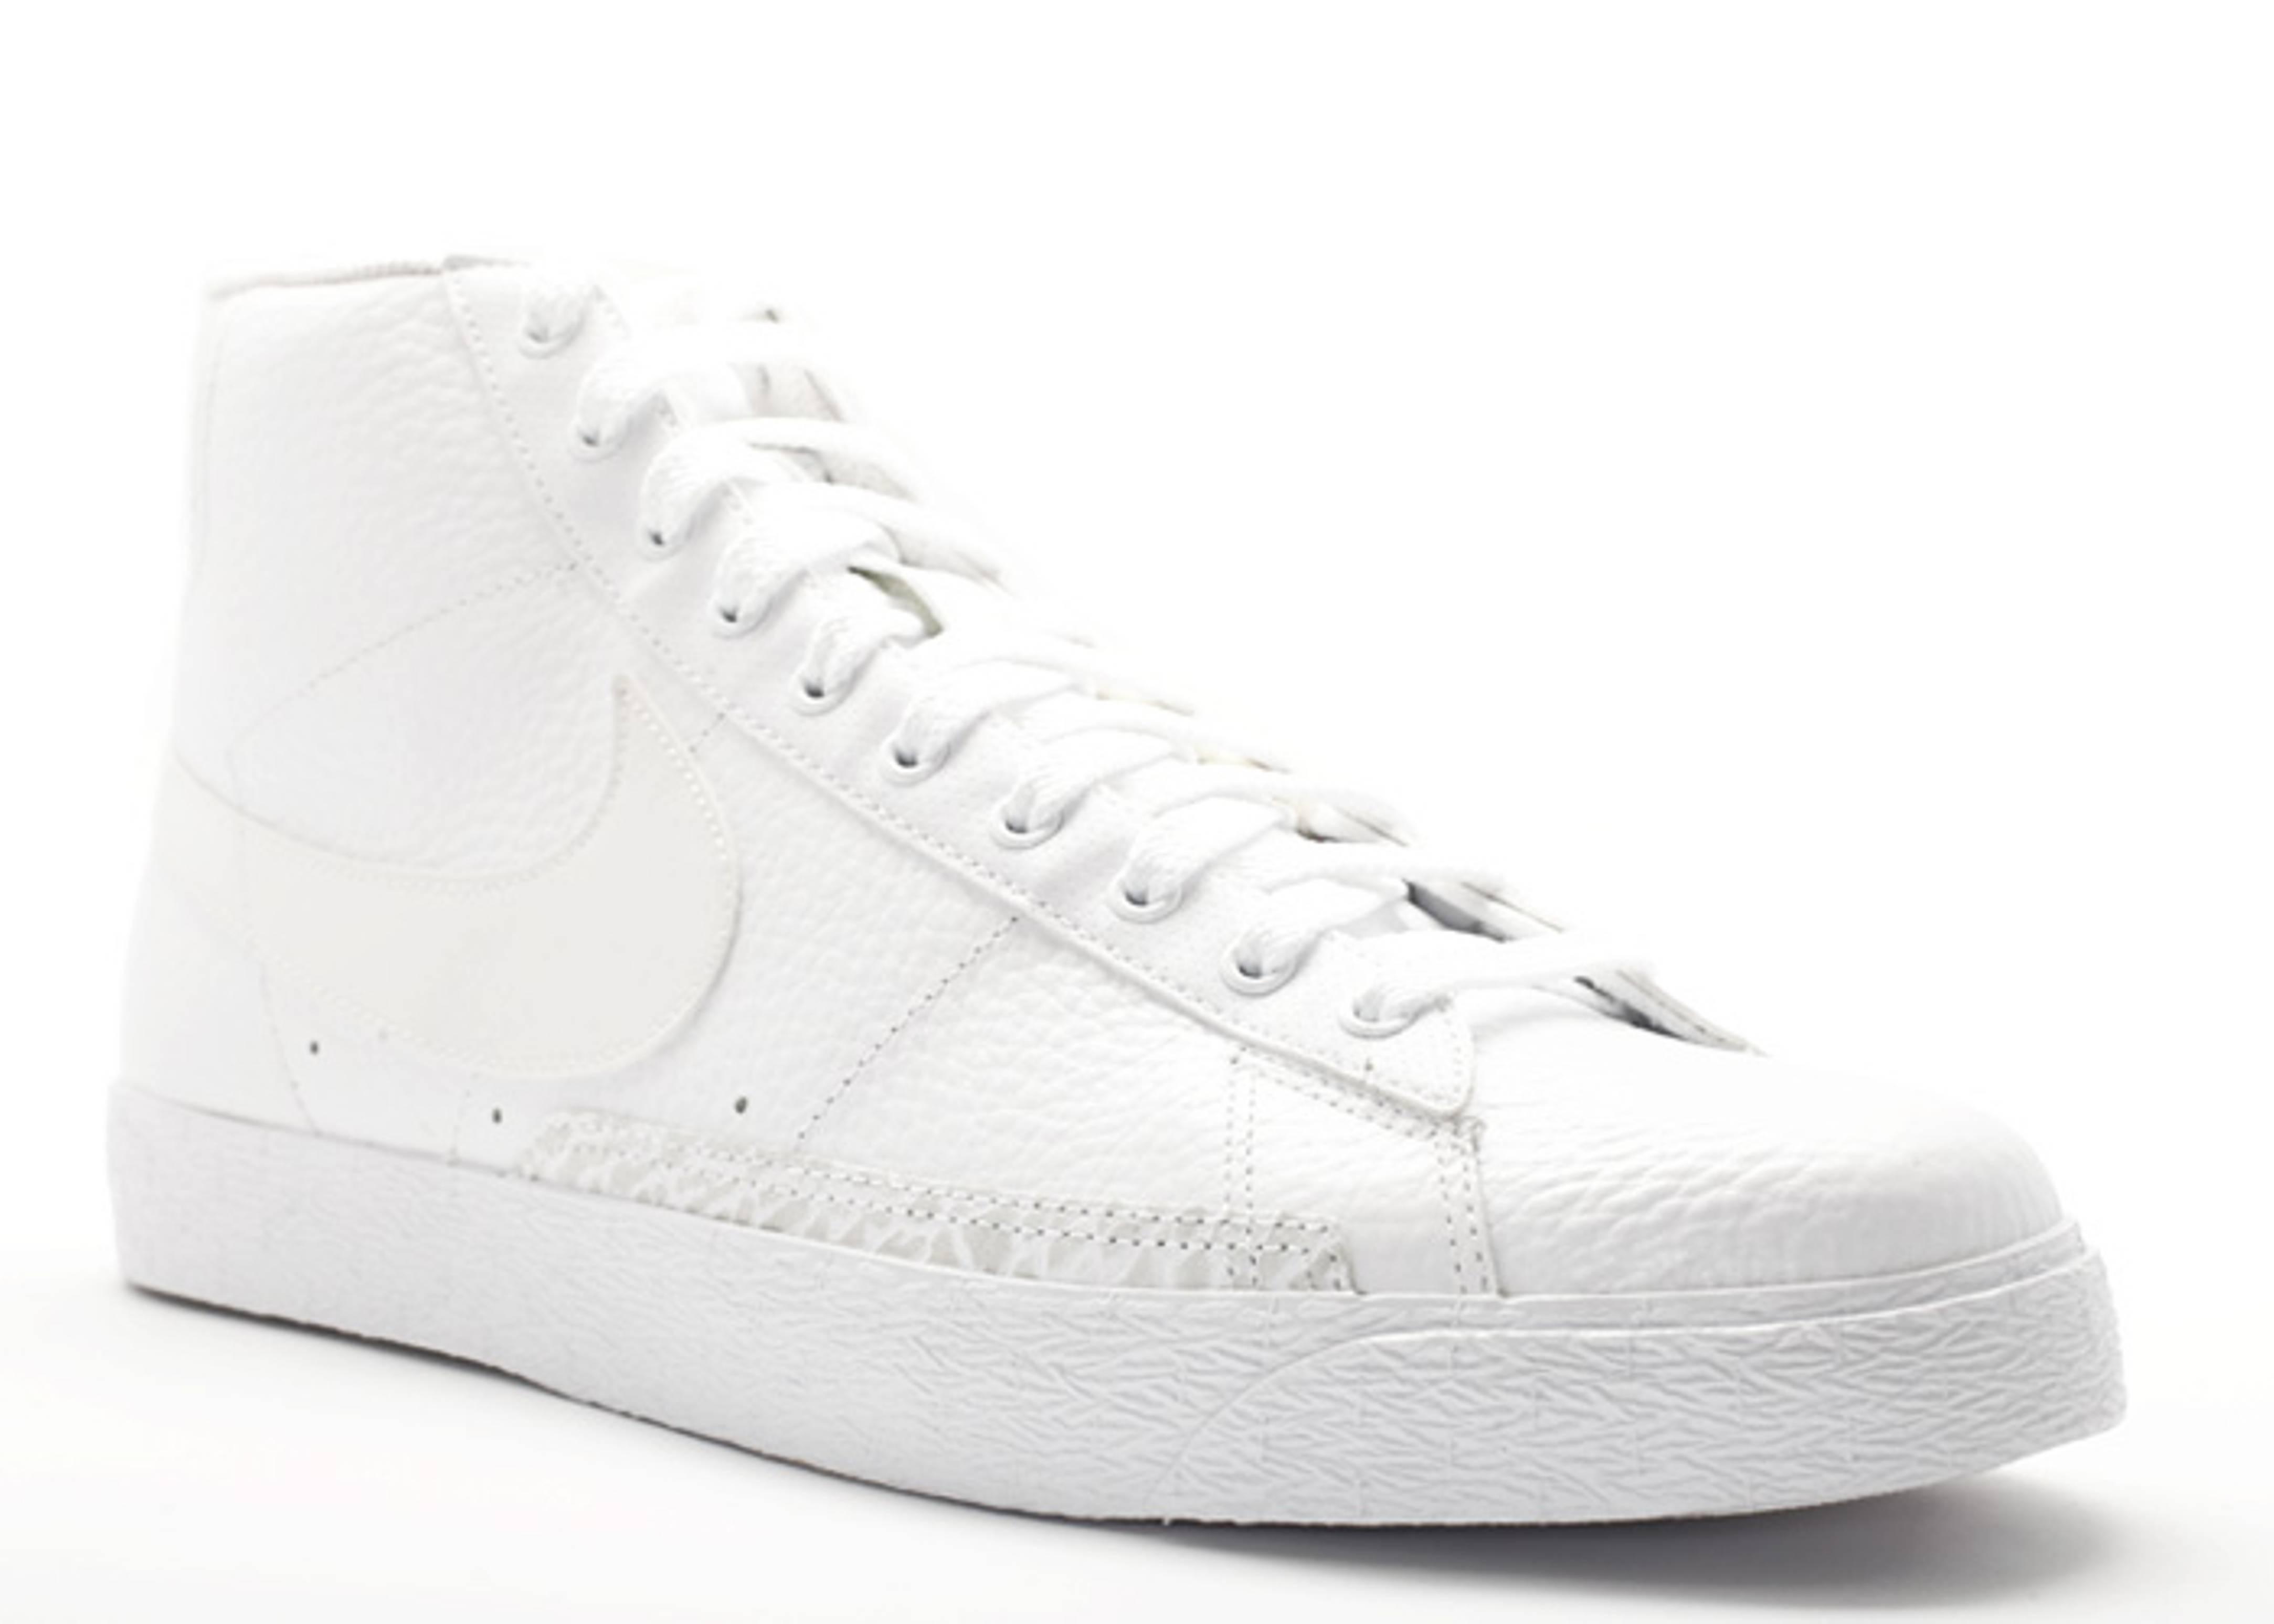 pretty nice b109d bd446 Blazer High - Nike - 316664 112 - white/white white | Flight ...